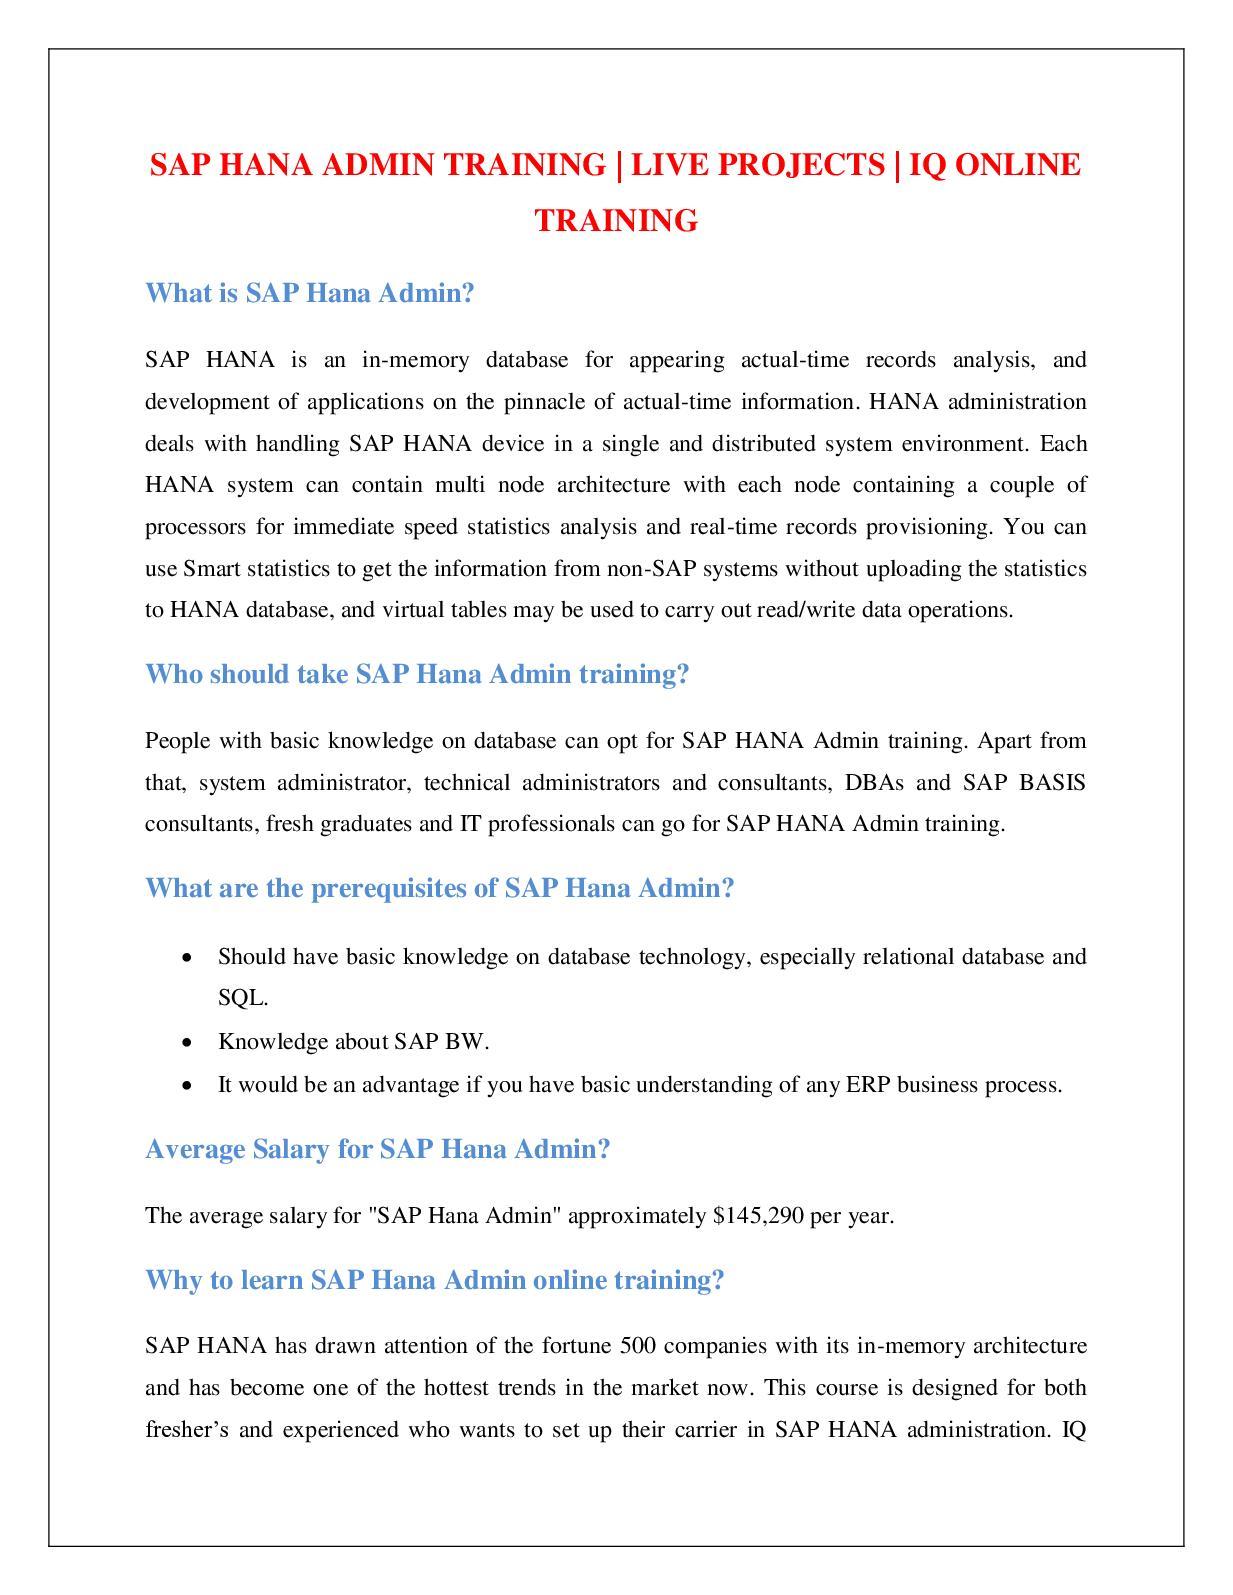 Calaméo - SAP HANA ADMIN TRAINING | LIVE PROJECTS | IQ